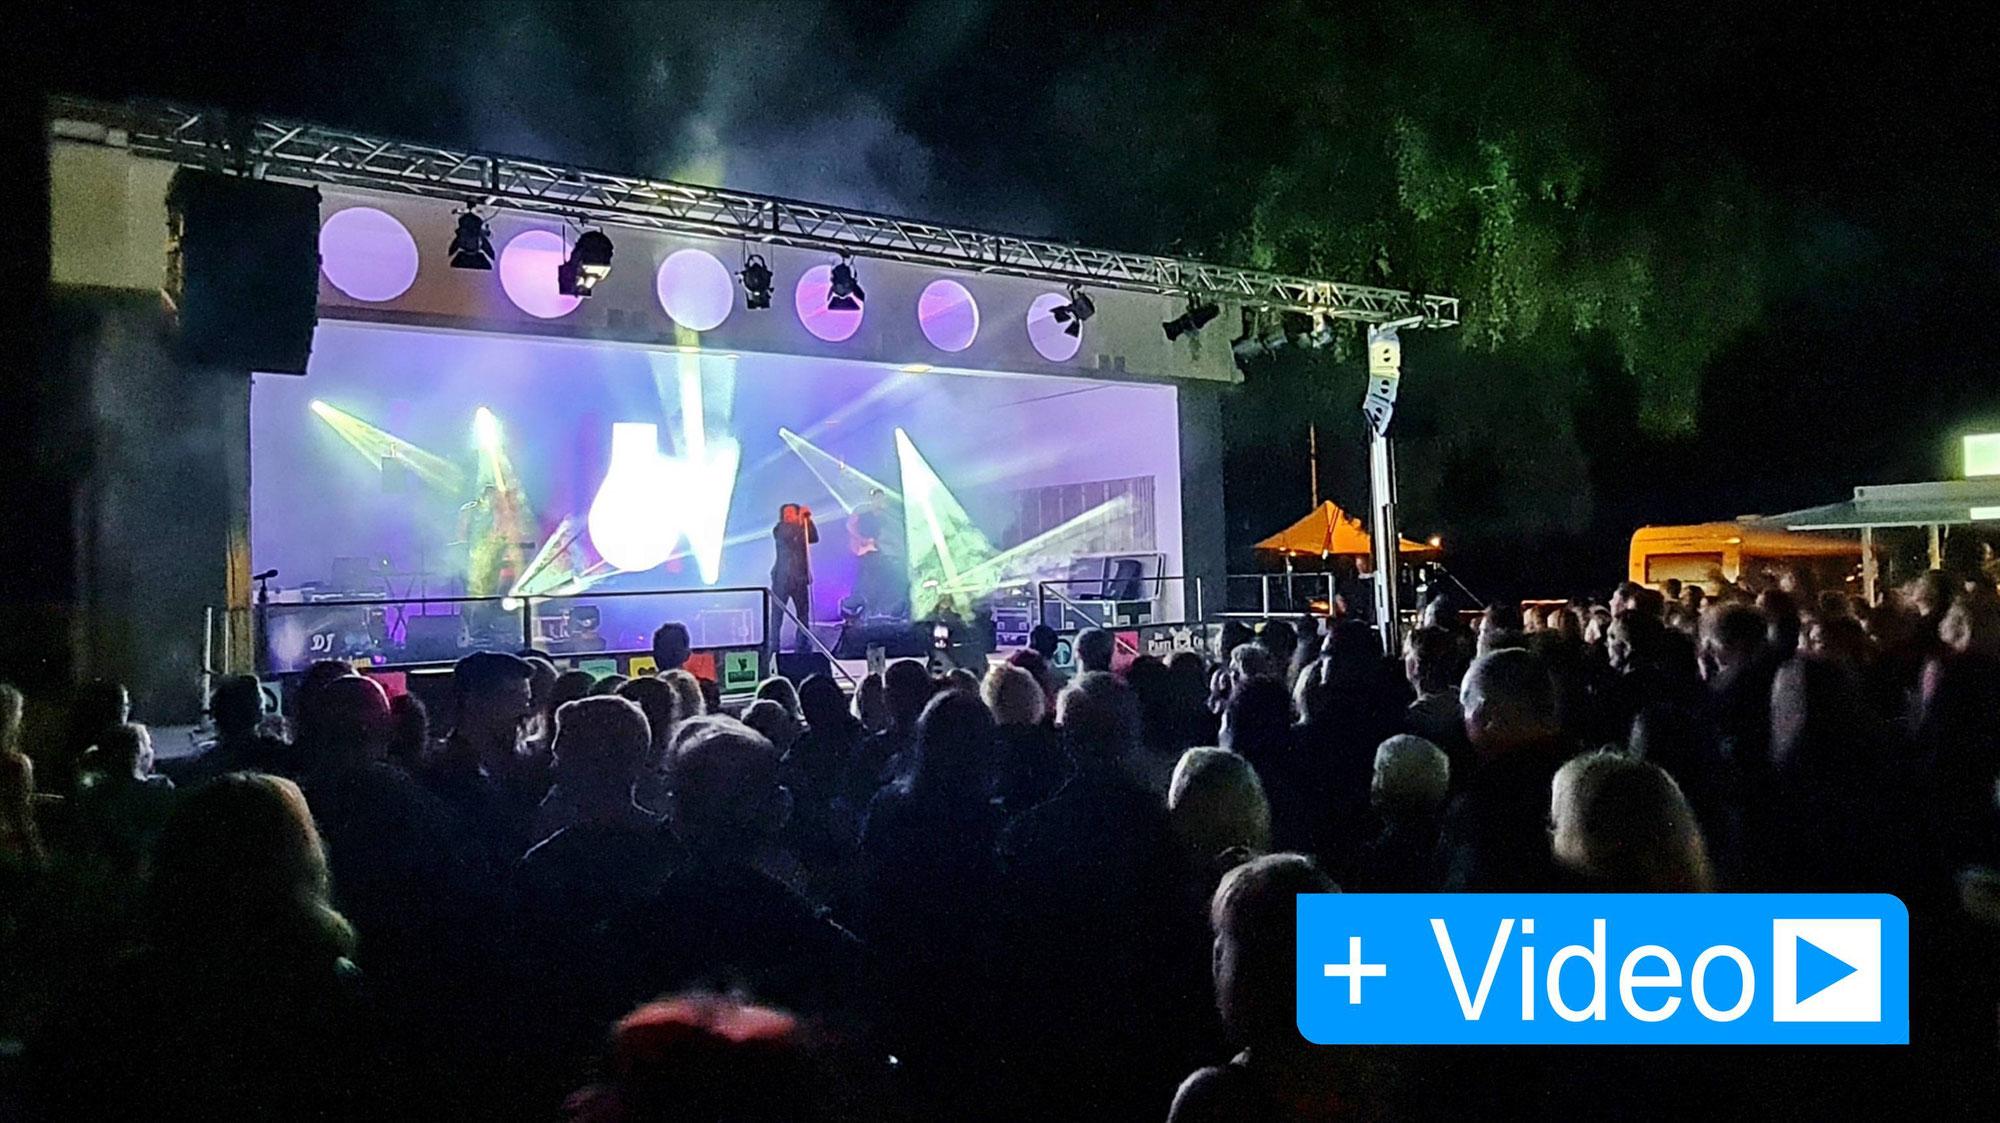 Tausend Fans feiern Depeche Mode Party im Strandbad Gerlebogk